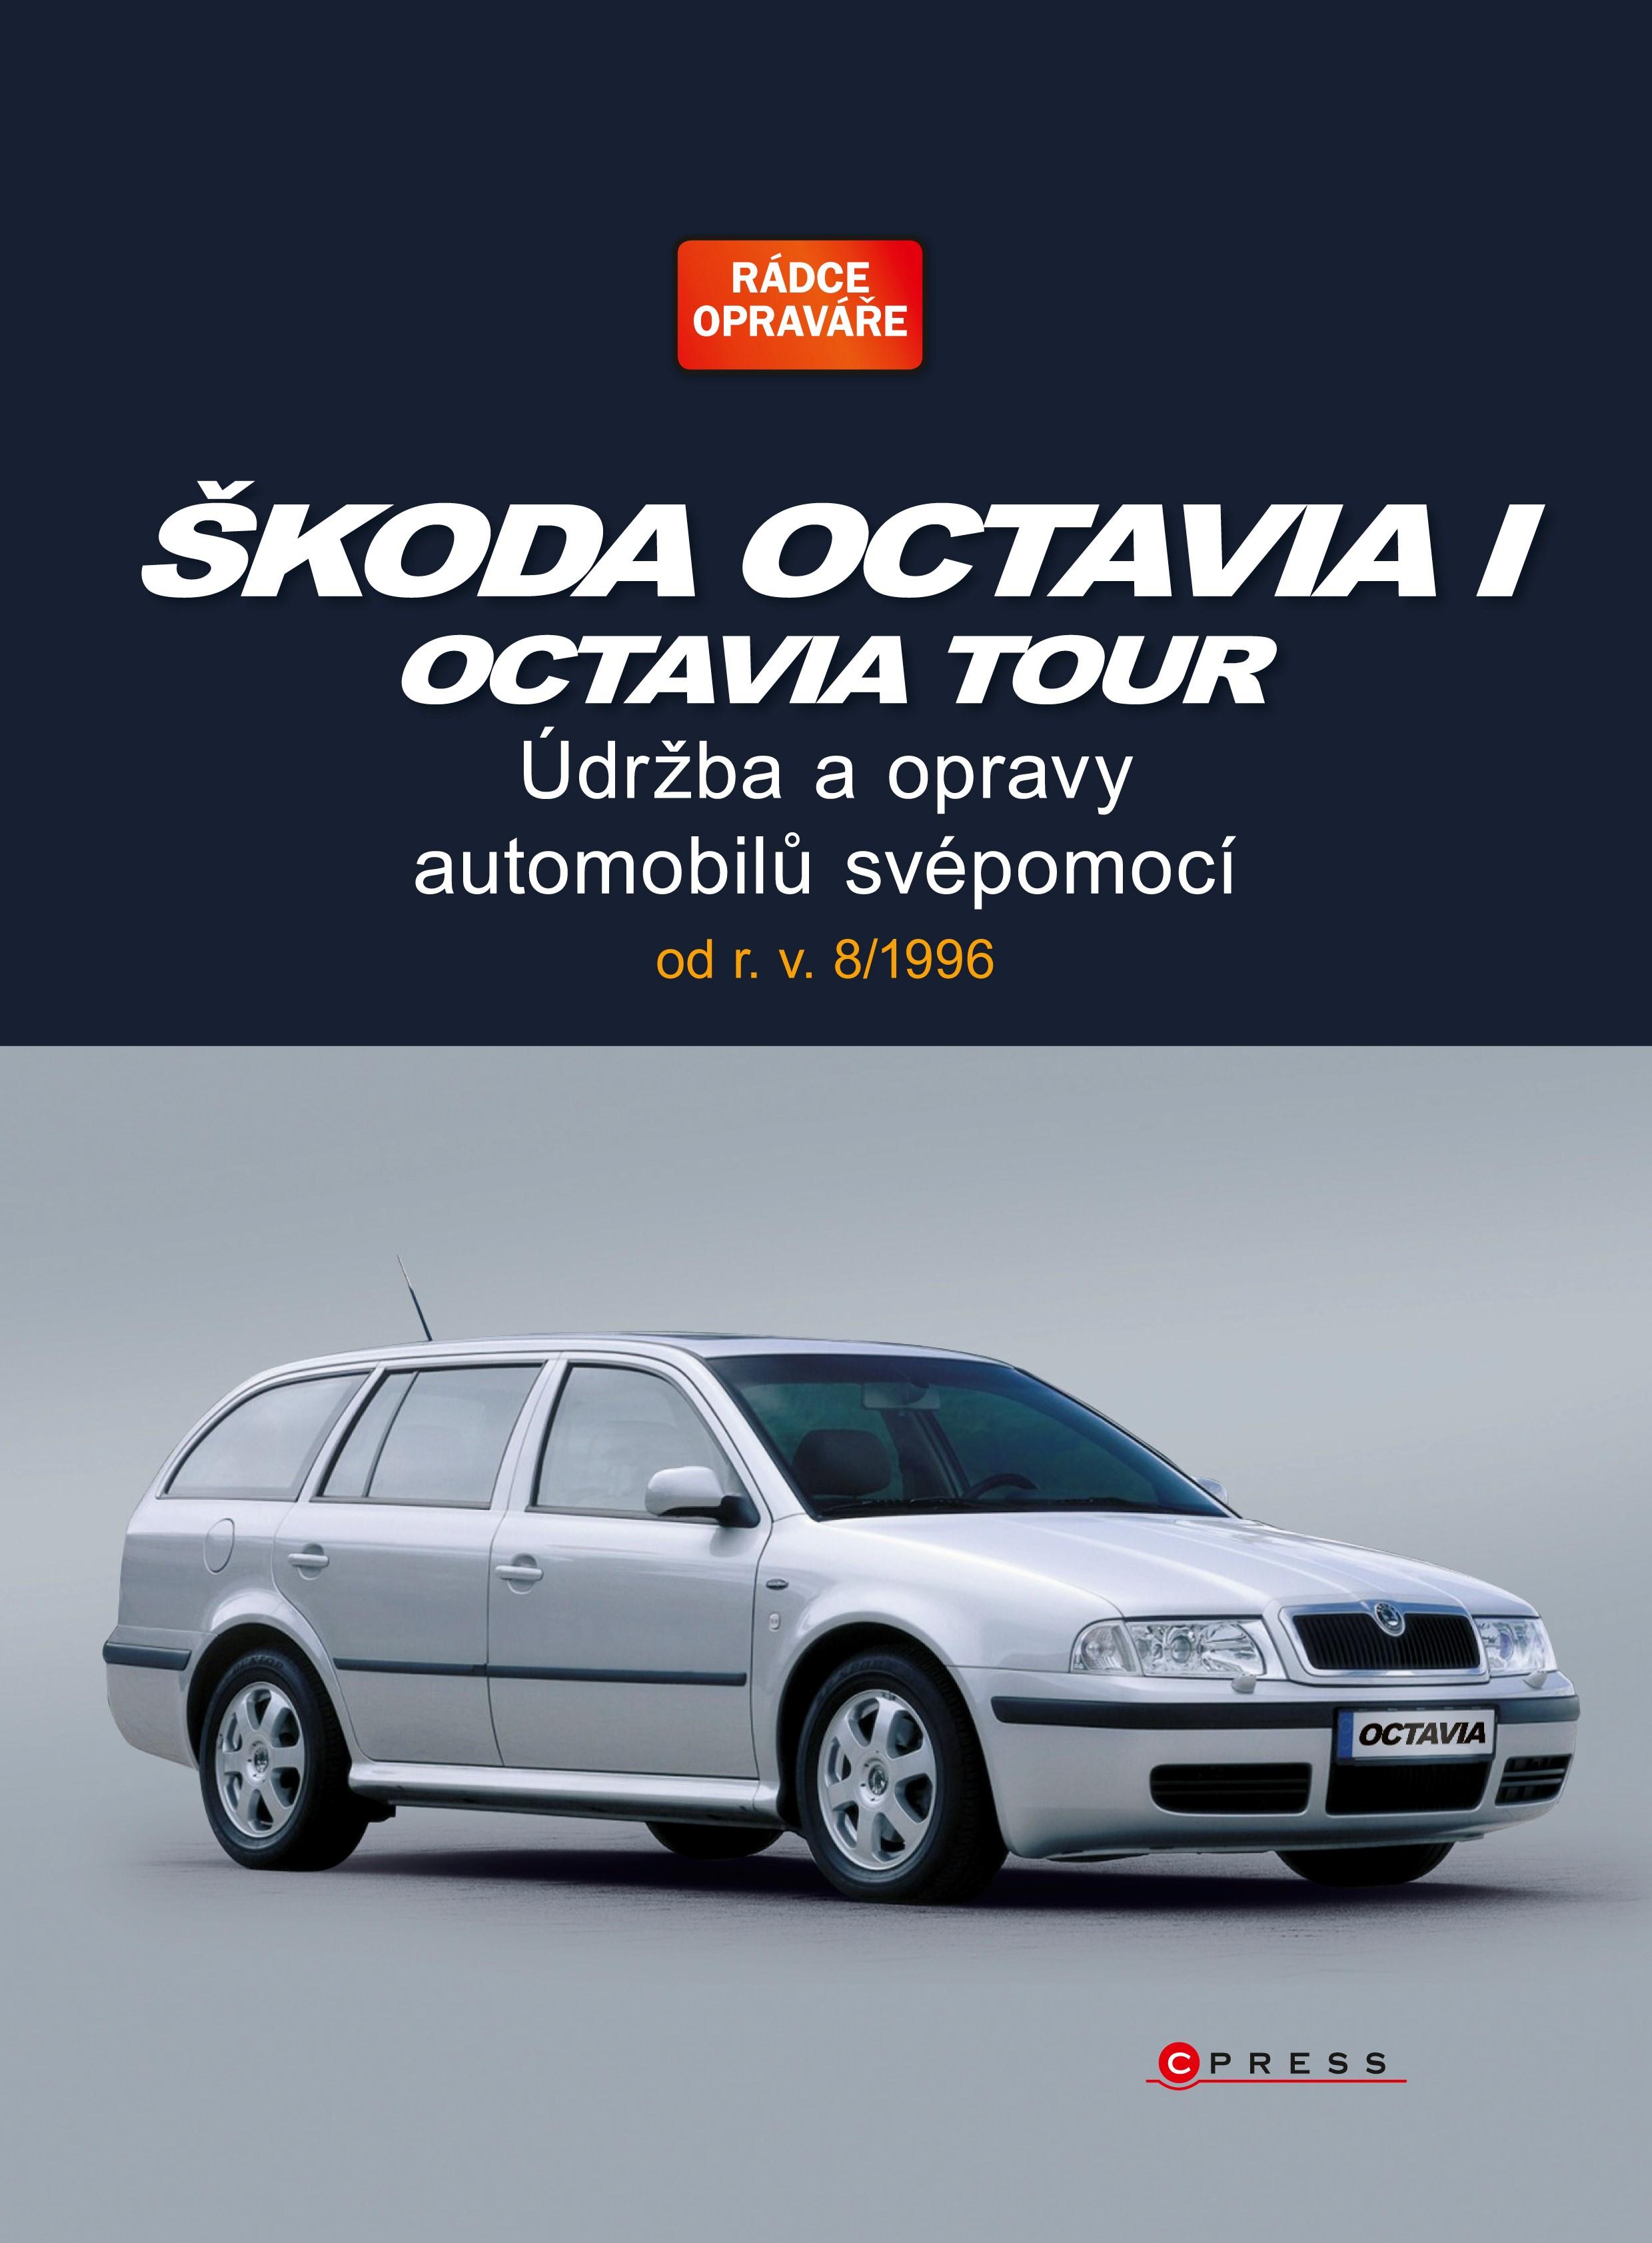 Škoda Octavia I Octavia Tour |